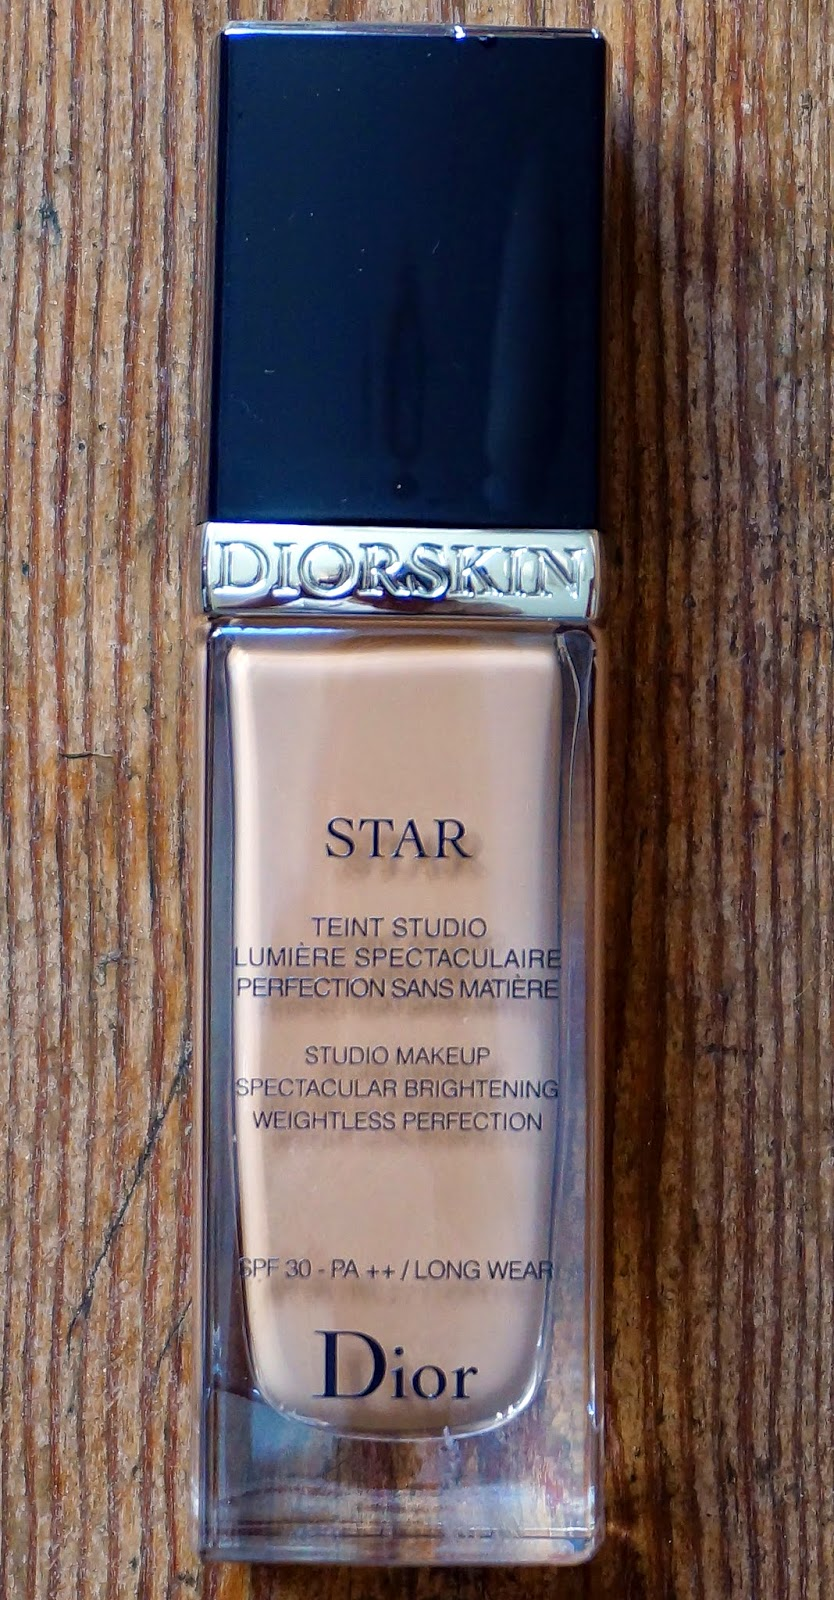 Diorskin Star Fluid Foundation